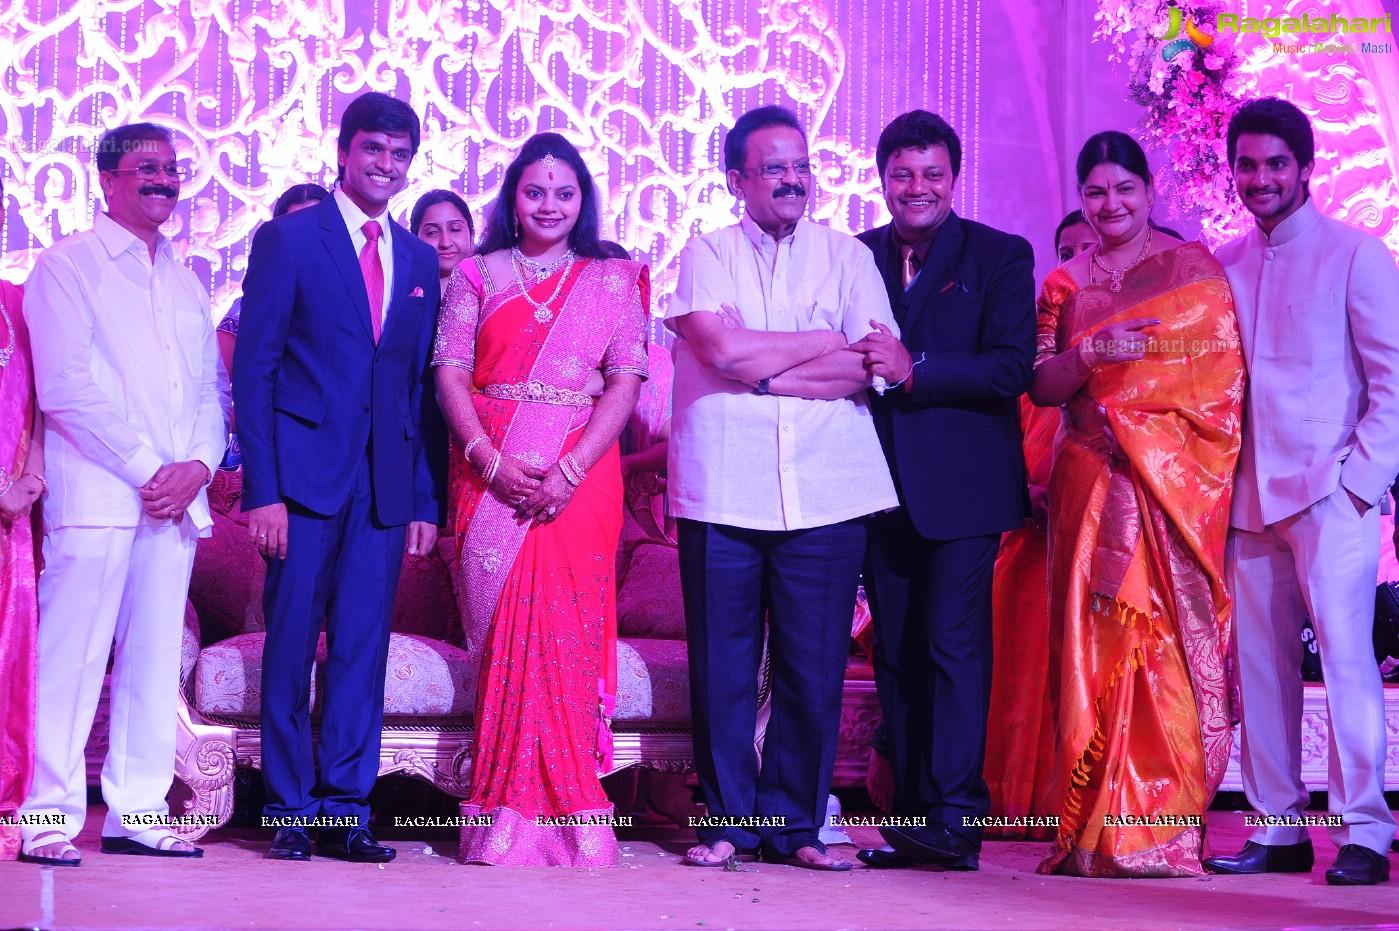 Sri Venkateswara The God who opened eyes for. - Star Sai Sai kumar family photo